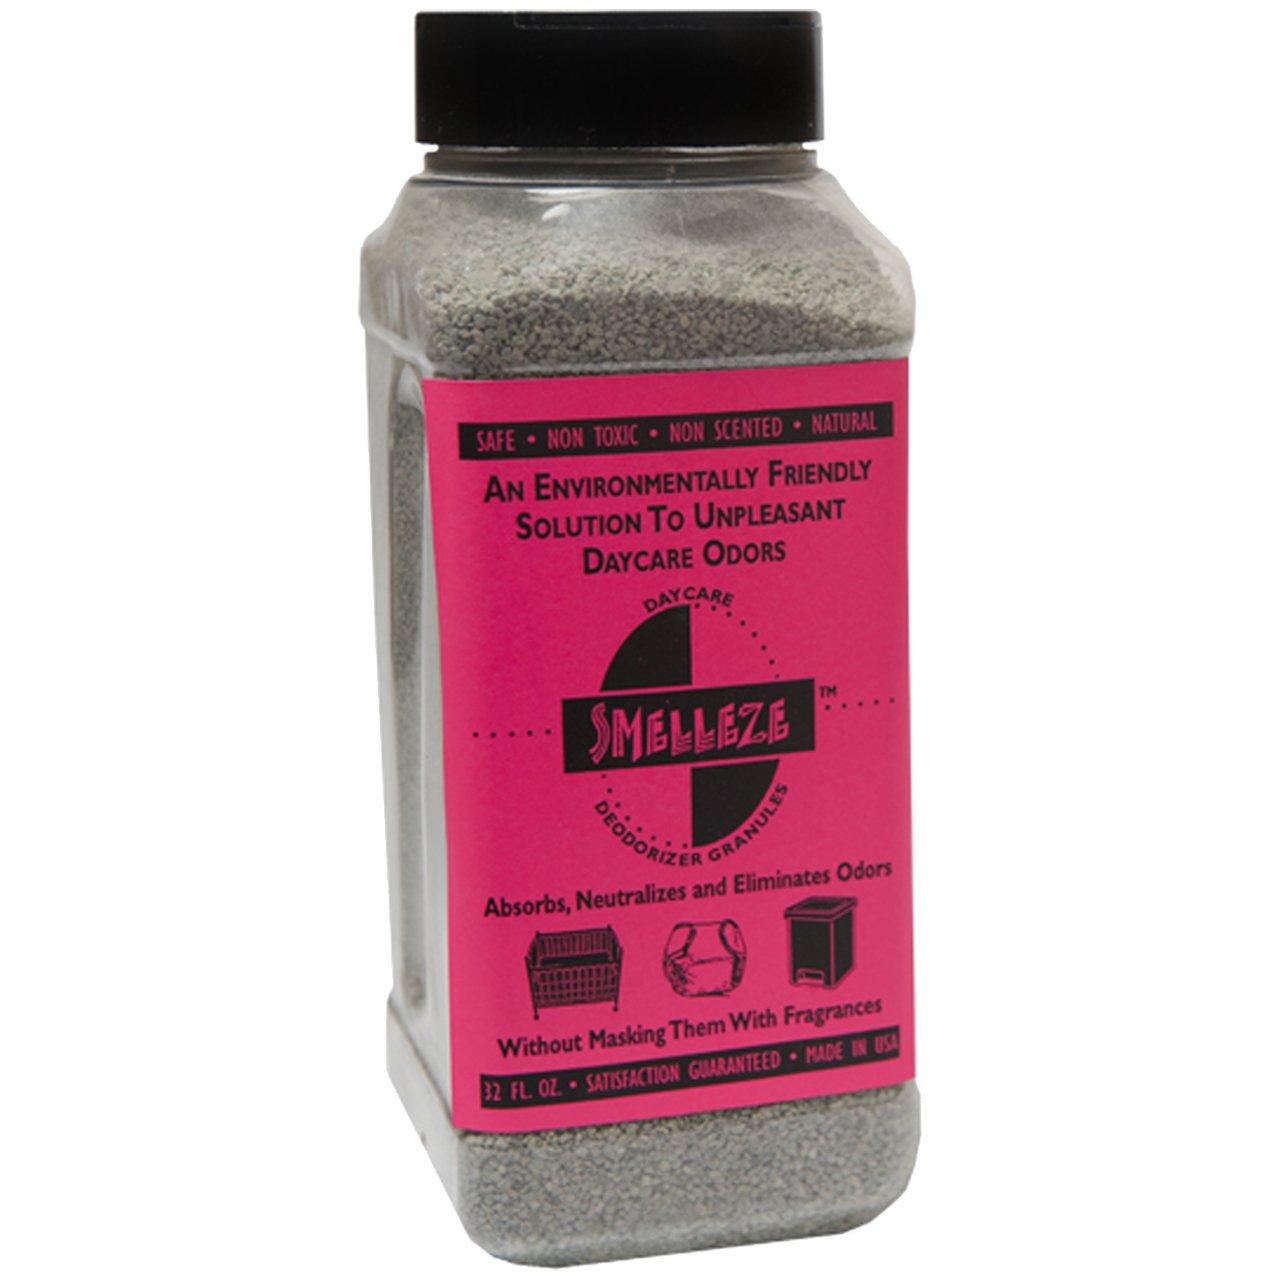 SMELLEZE Natural Child Odor Remover 2 Colorado Max 73% OFF Springs Mall Deodorizer: lb. E Granules